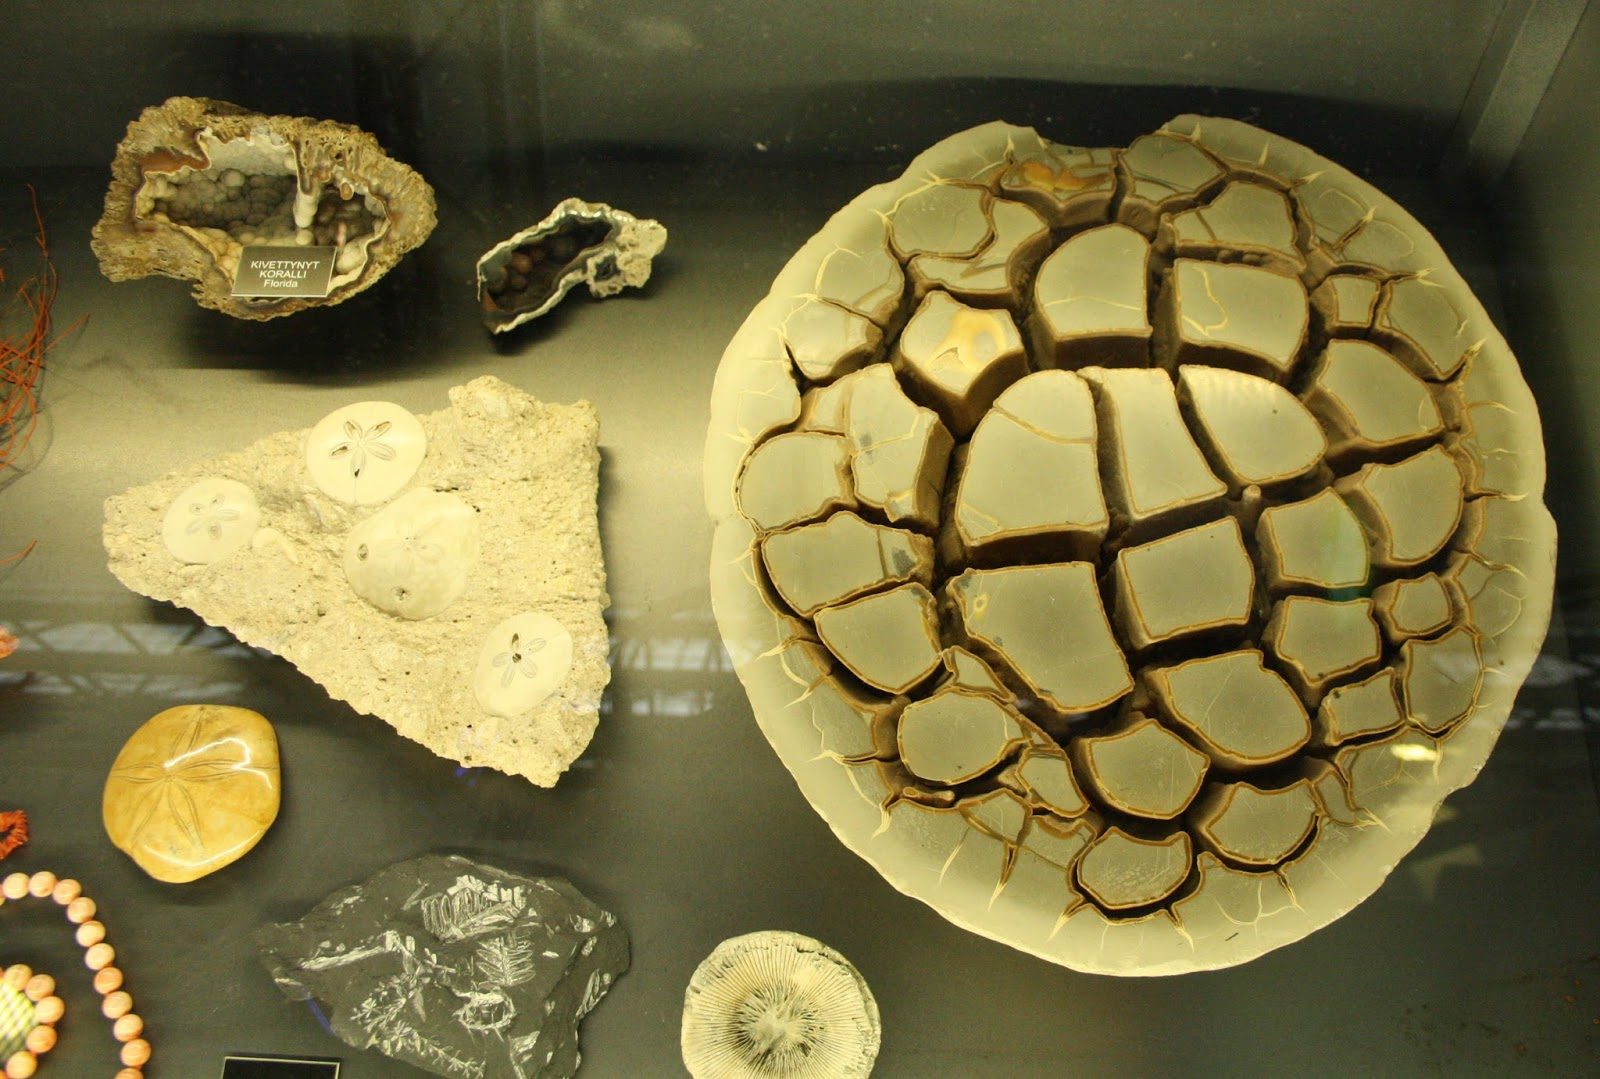 Museokeskus vapriikki, tampere, tampella, kivimuseo